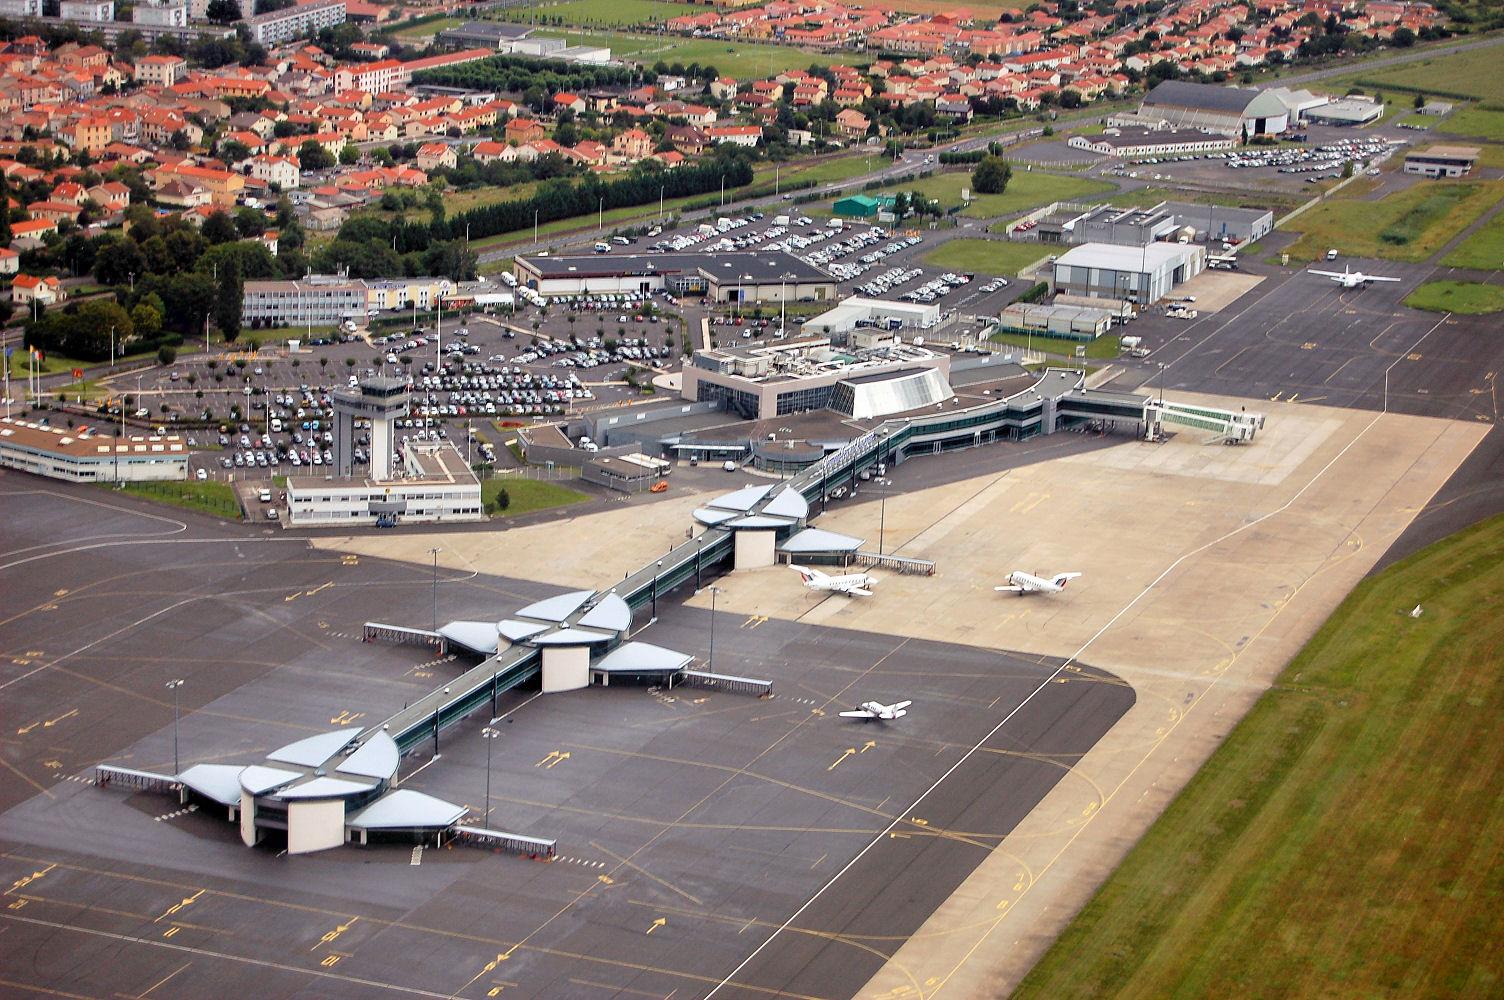 Clermont-Ferrand-Auvergne-Airport